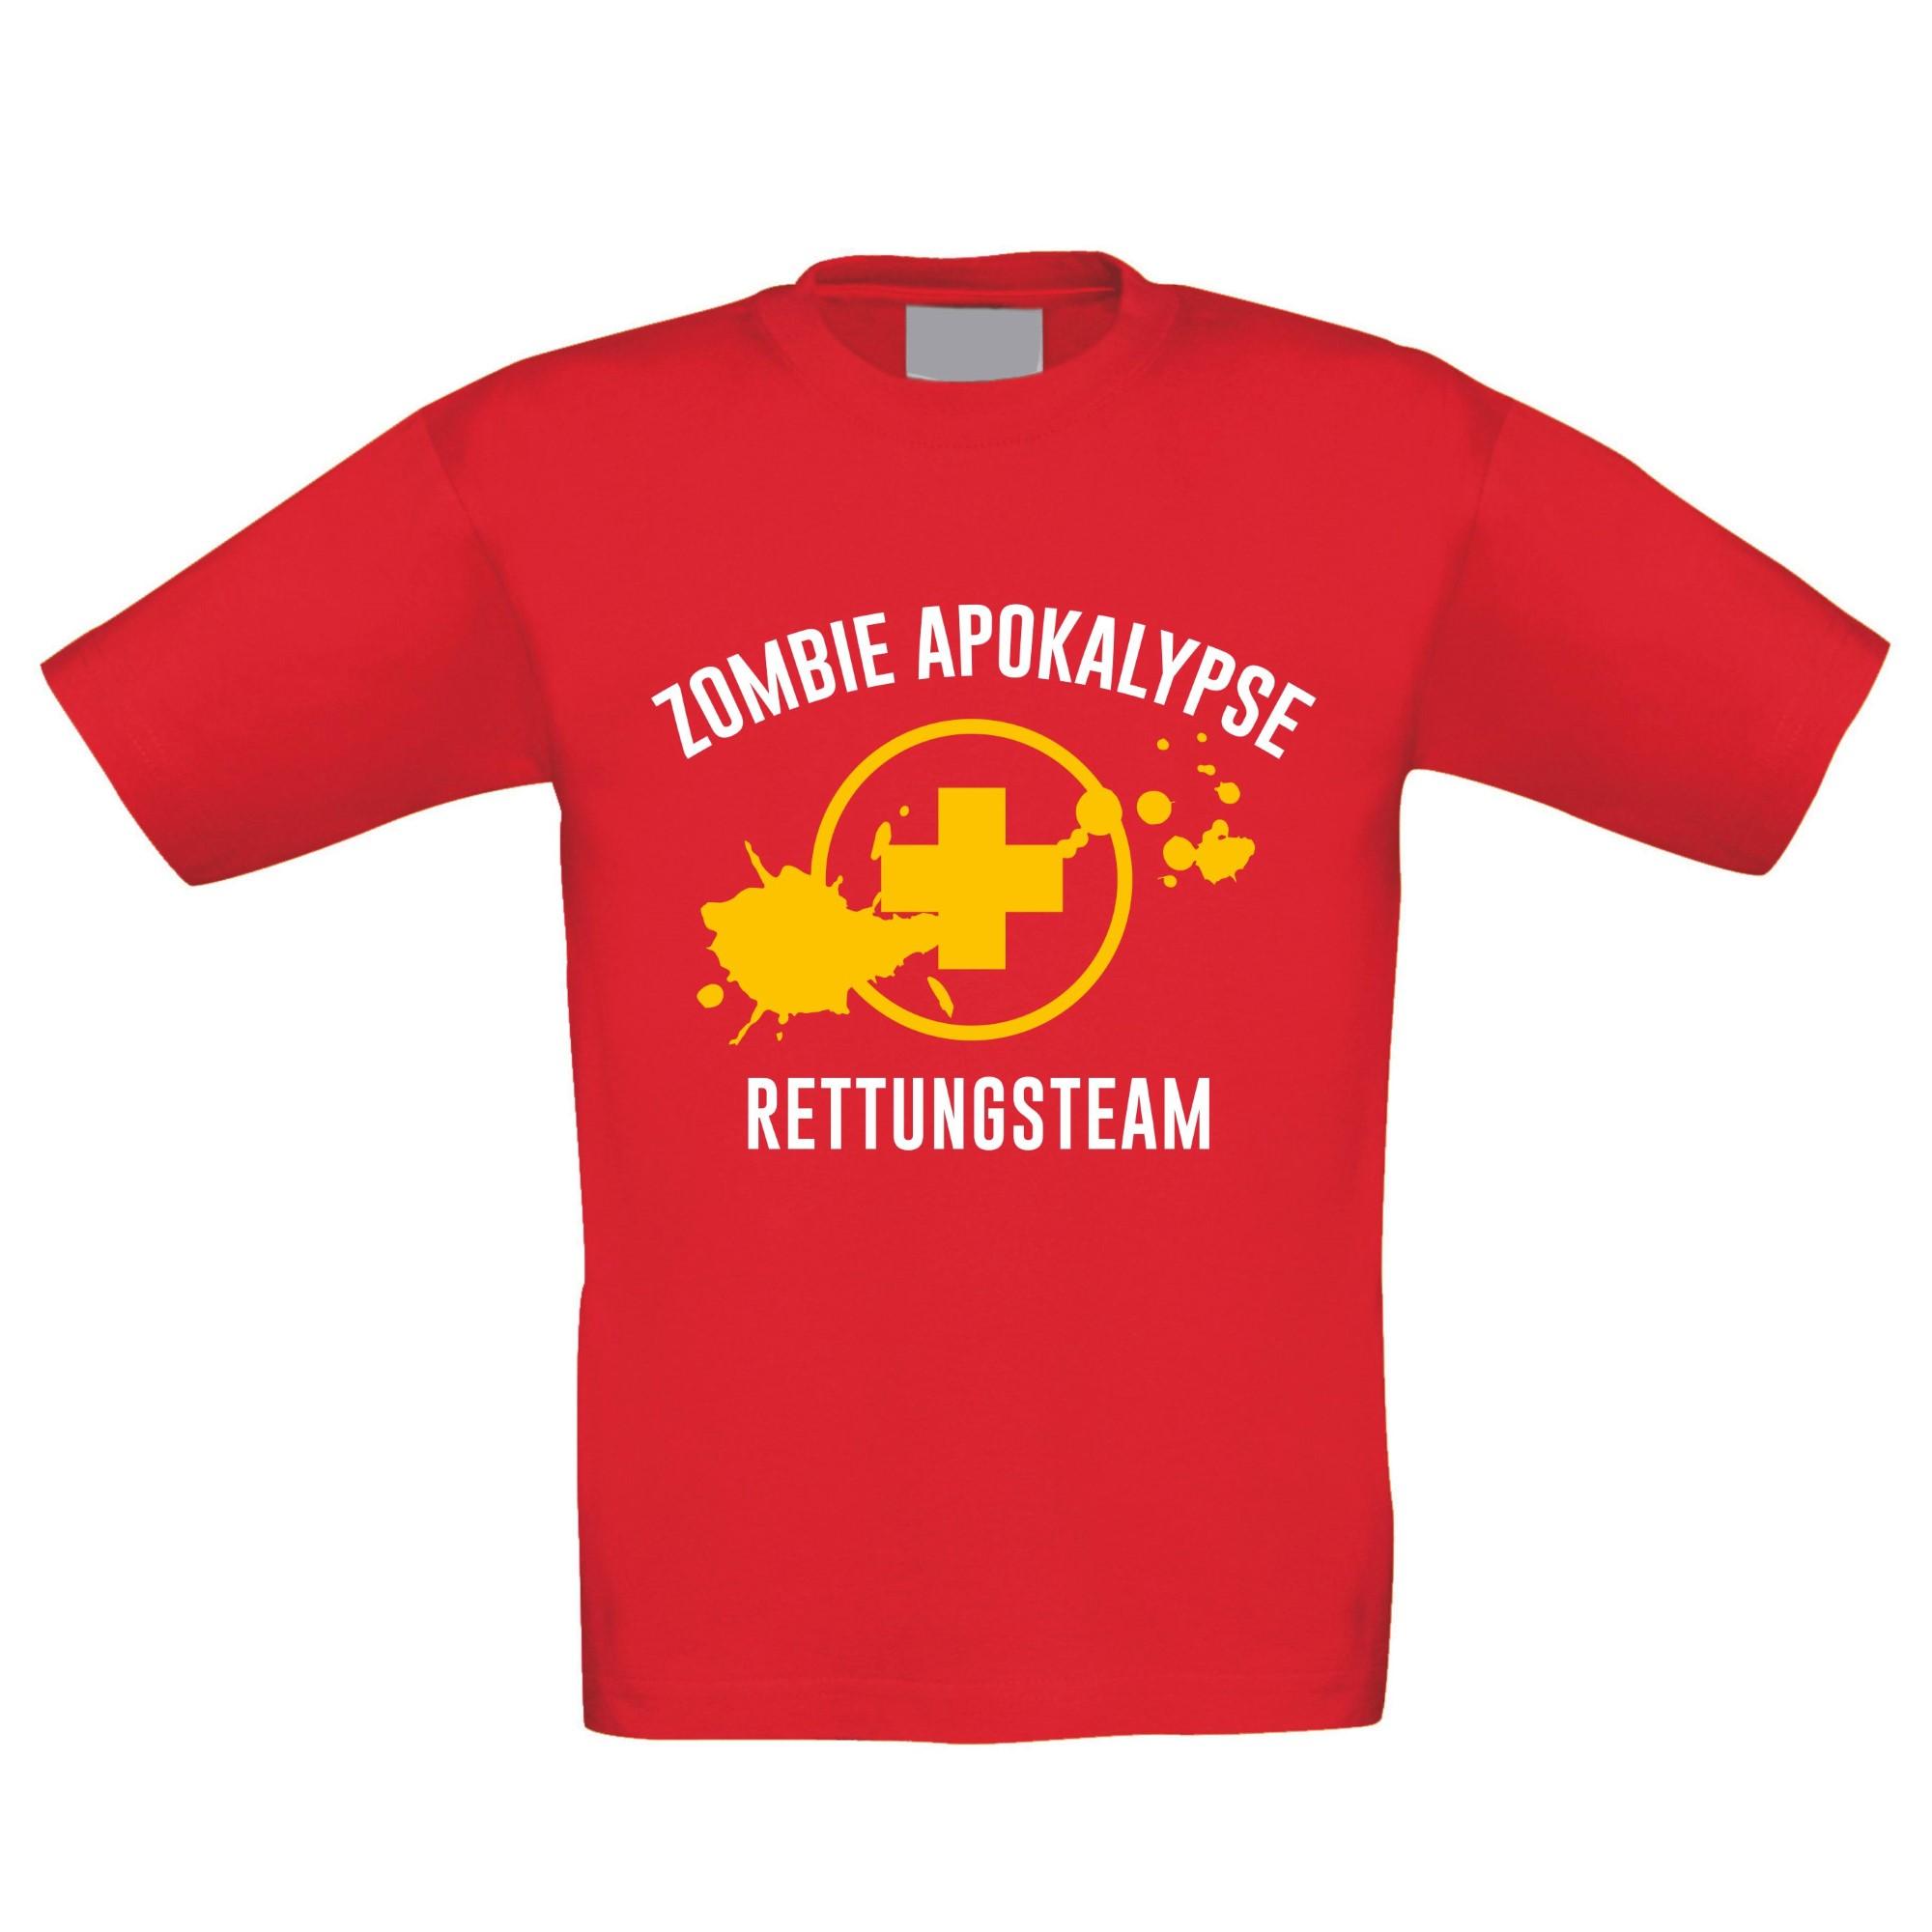 kinder-t-shirt-zombie-apokalypse-rot-gelb.jpg